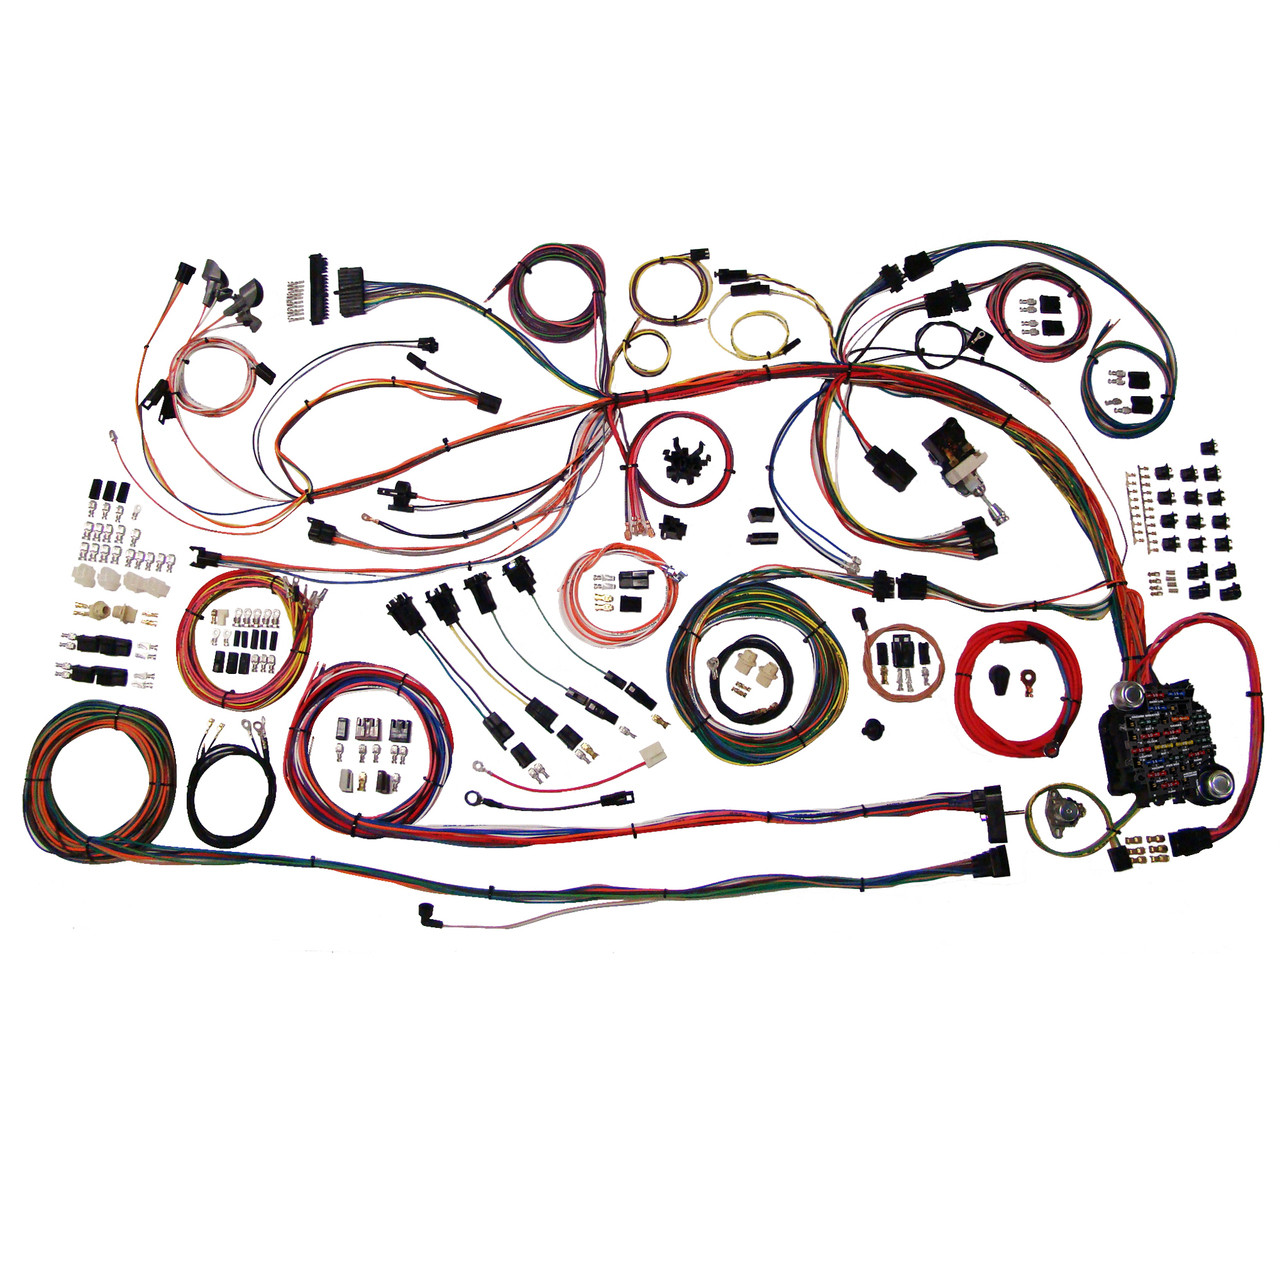 el camino turn signal wiring diagram on 86 mustang wiring diagram 76 nova wiring diagram  [ 1280 x 1280 Pixel ]